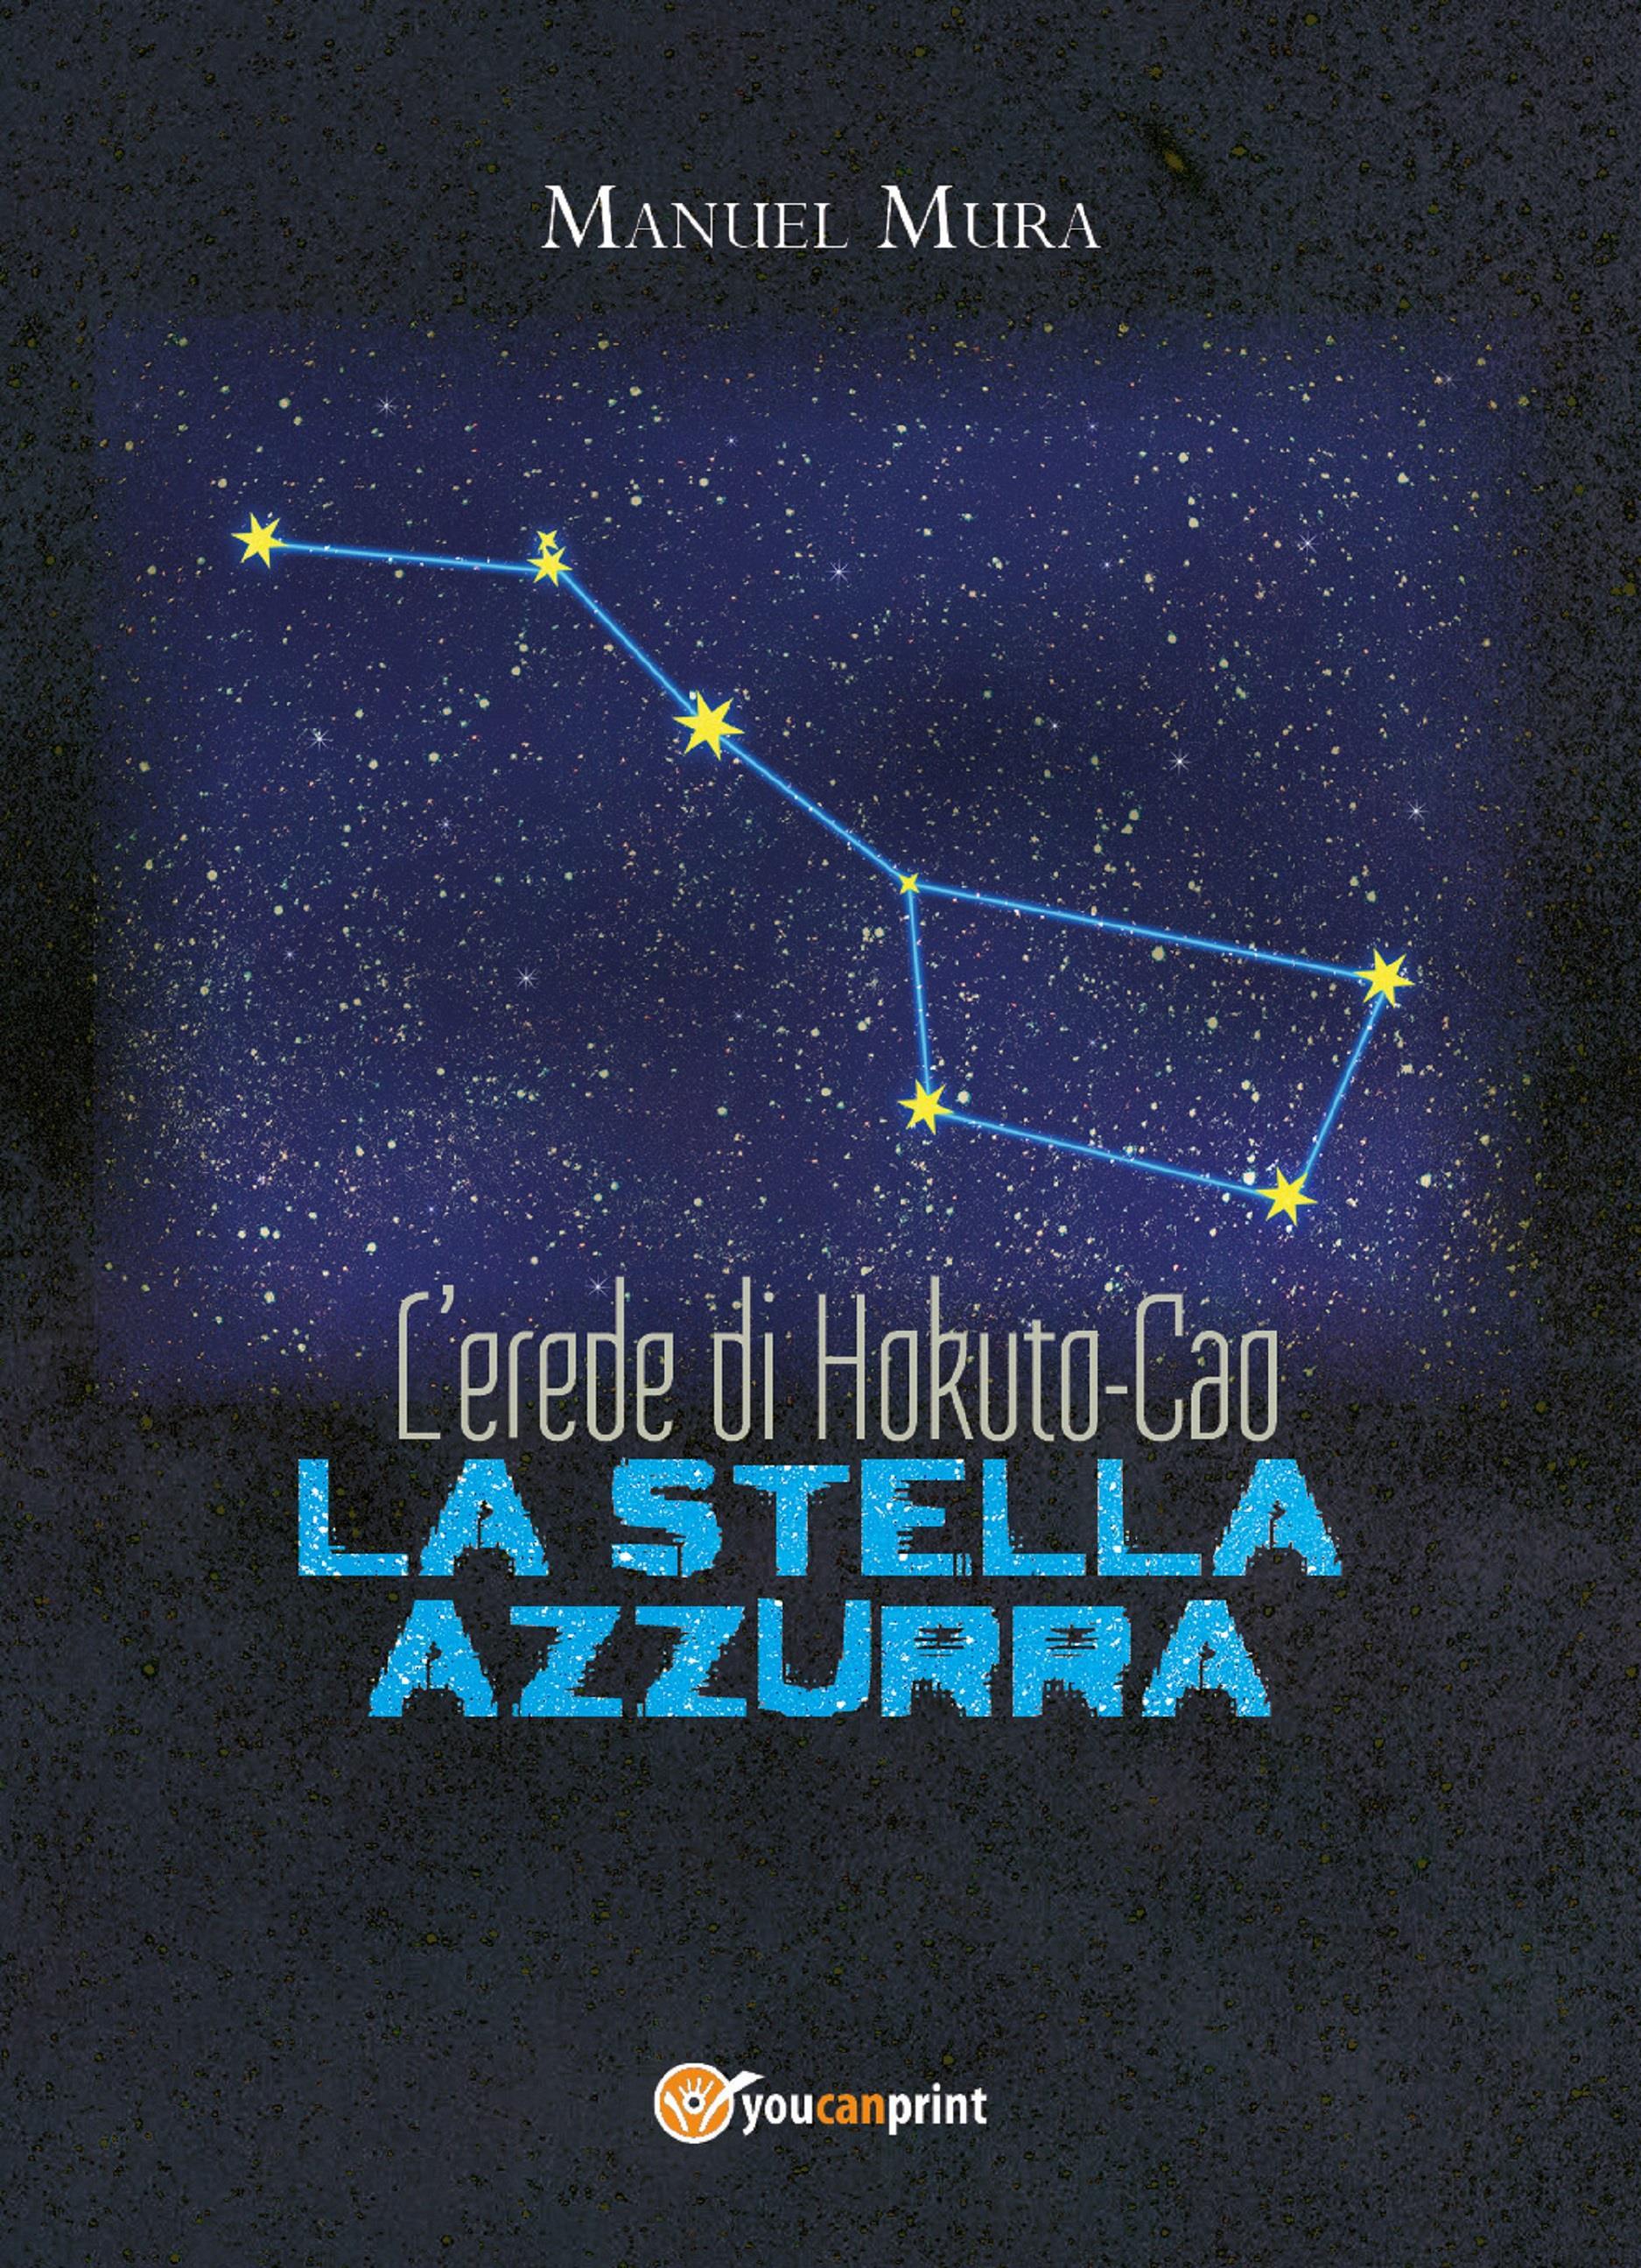 L'erede di Hokuto-Cao - La stella azzurra